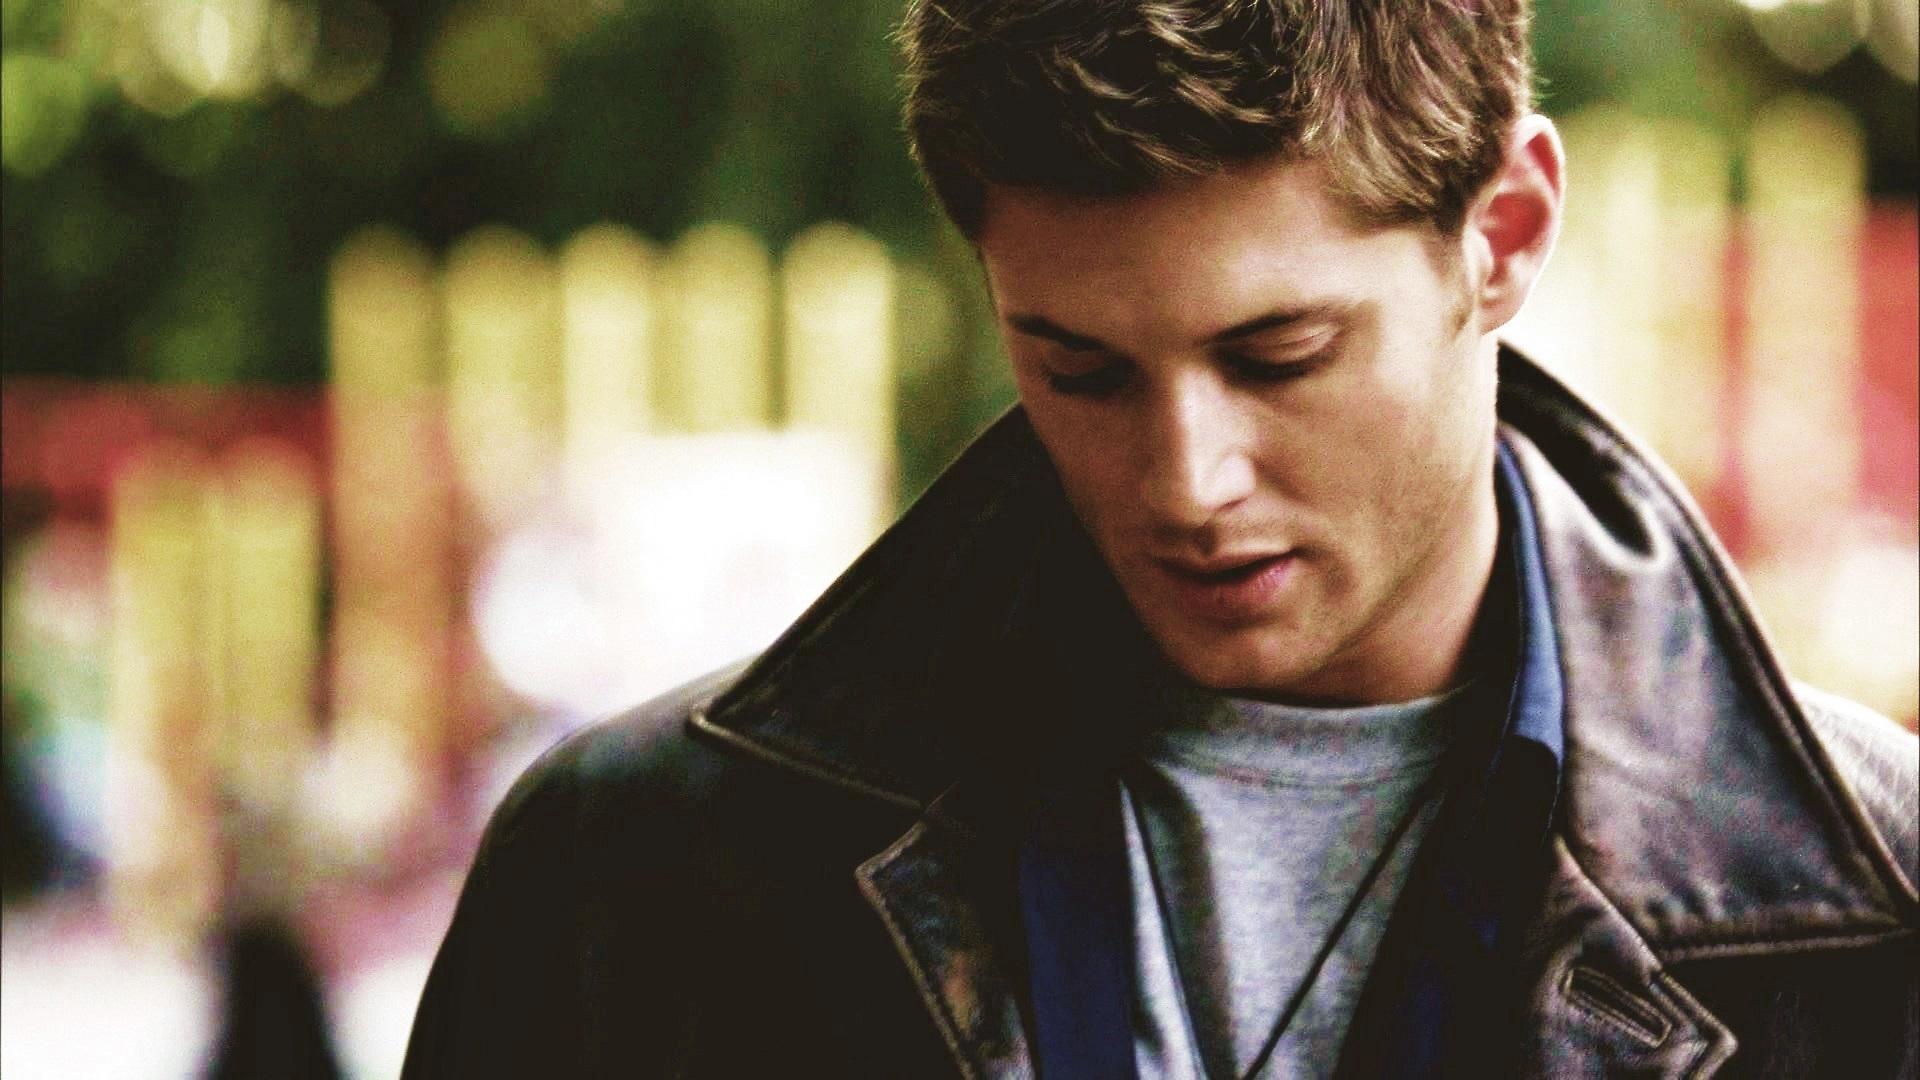 Supernatural Dean Winchester 02 By Legendaryadelia On